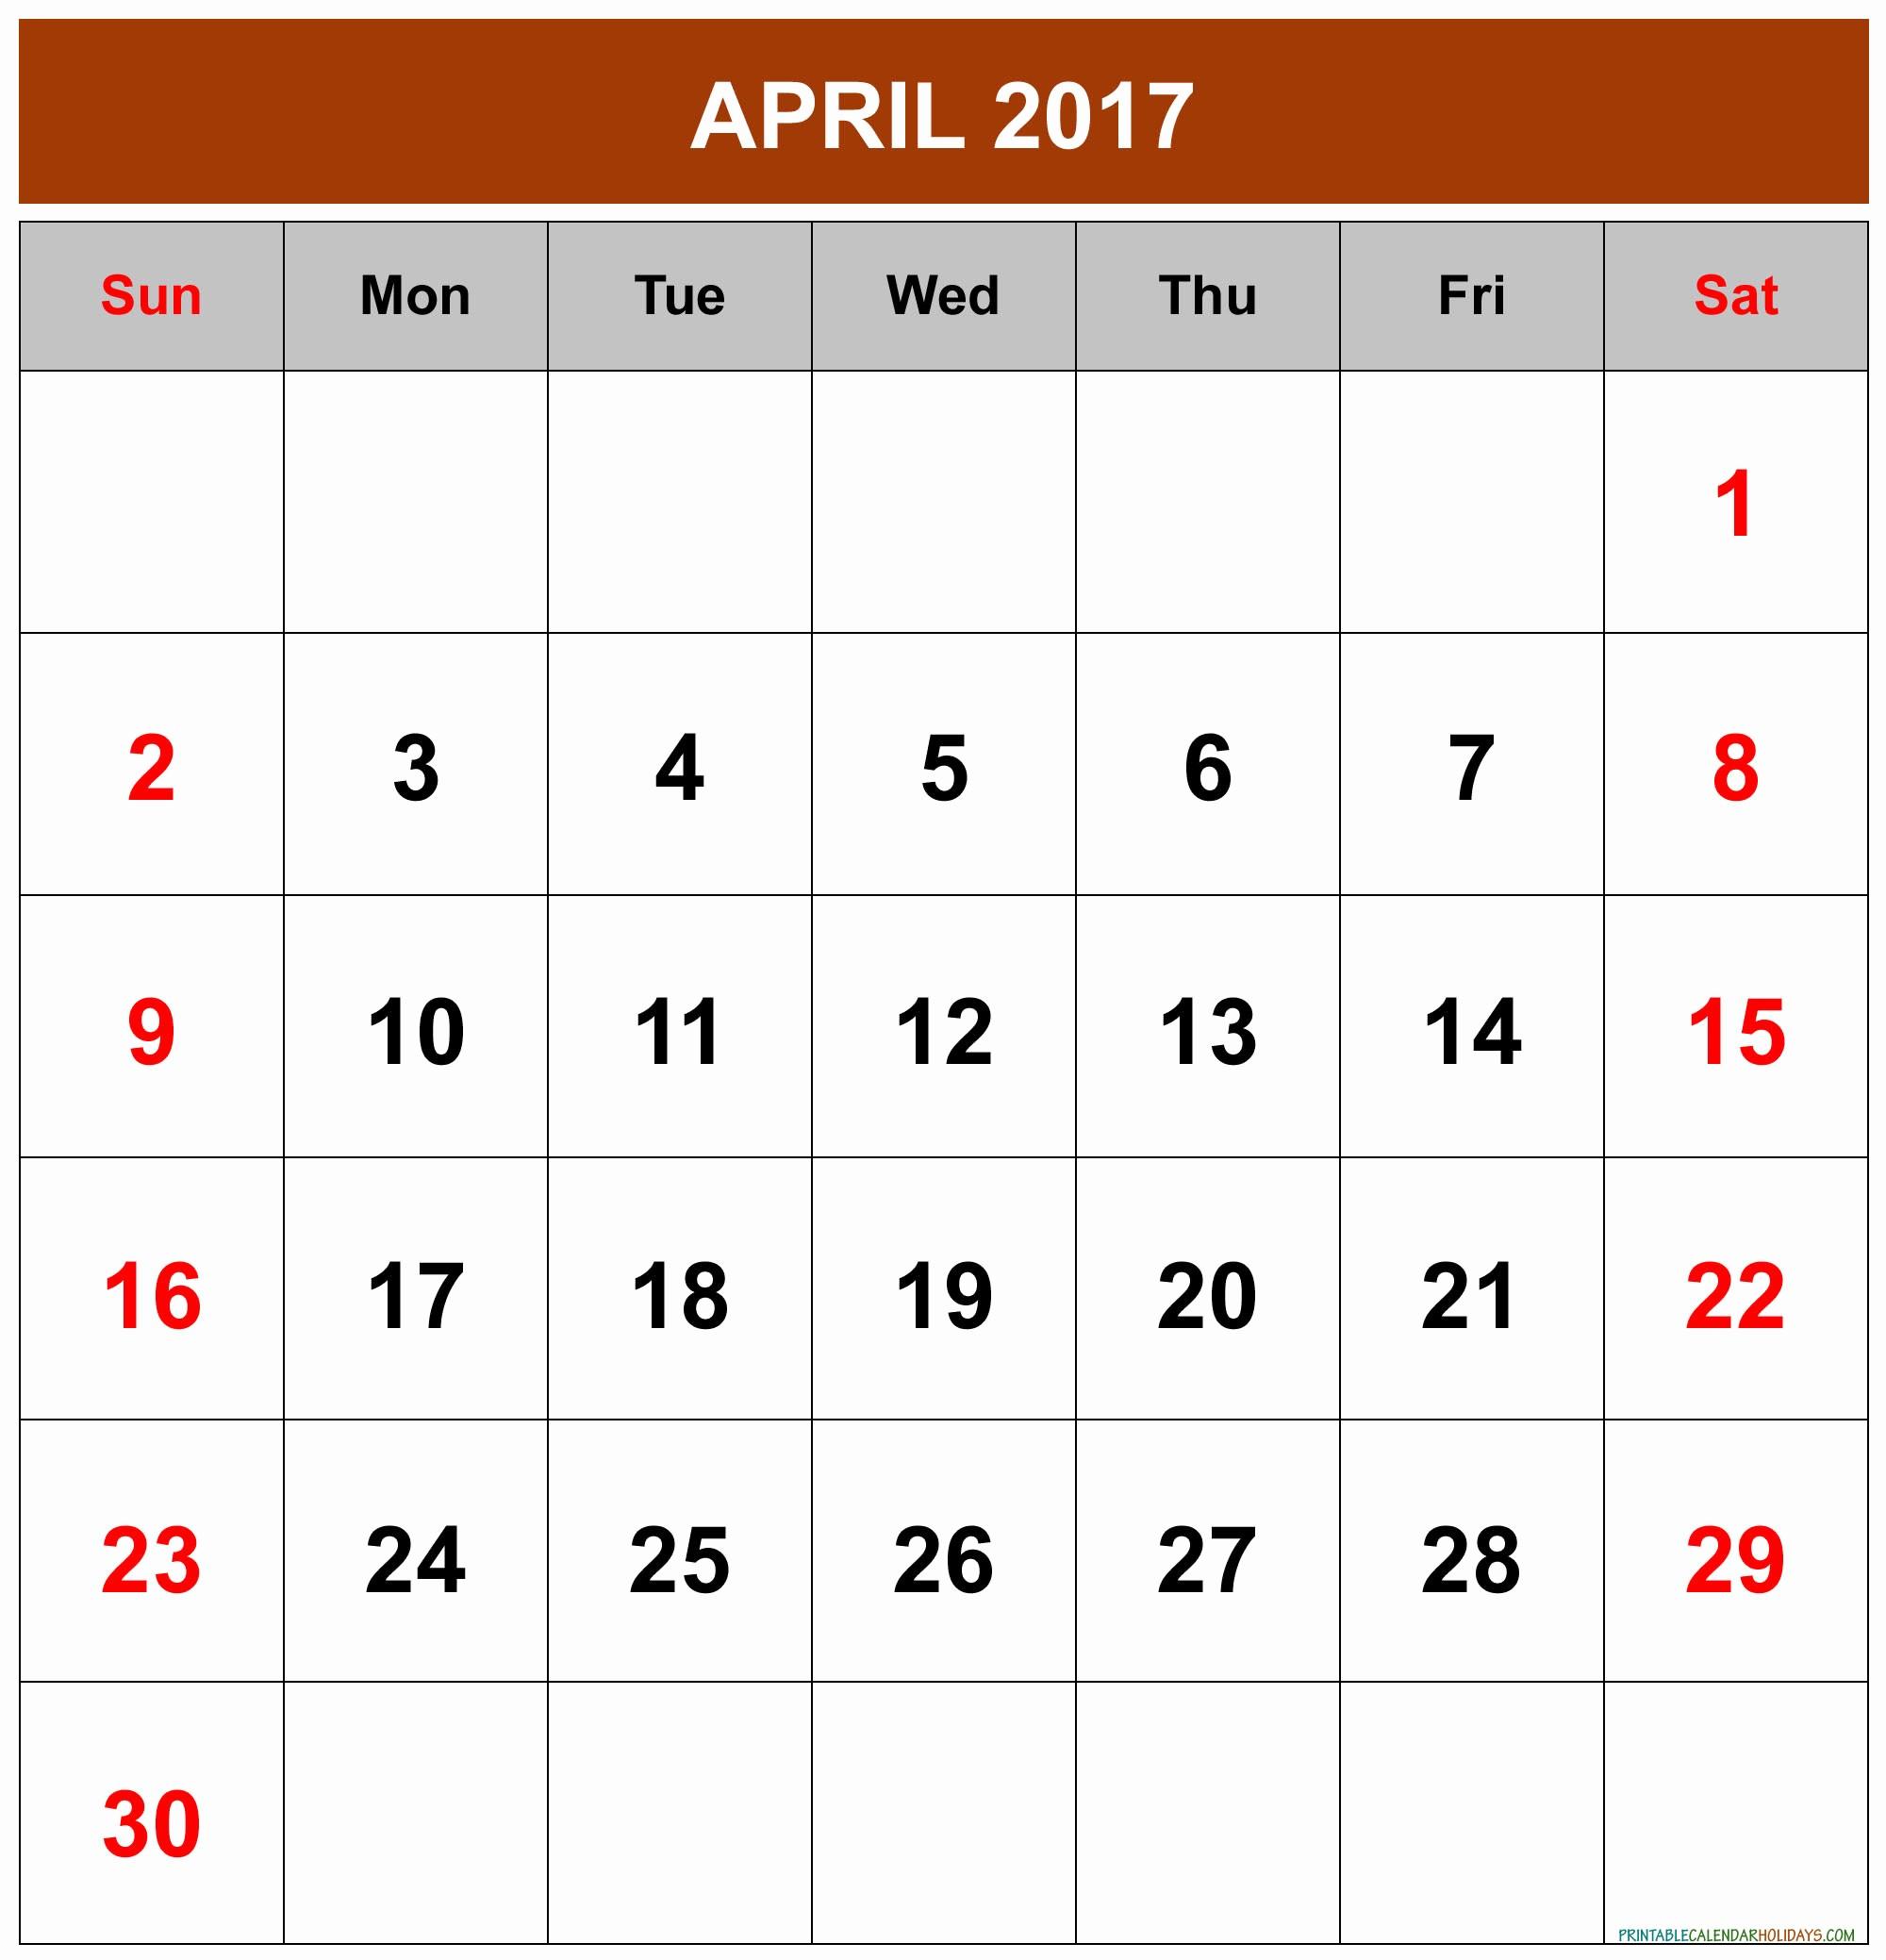 Free 2017 Printable Calendar Word New April 2017 Calendar Word